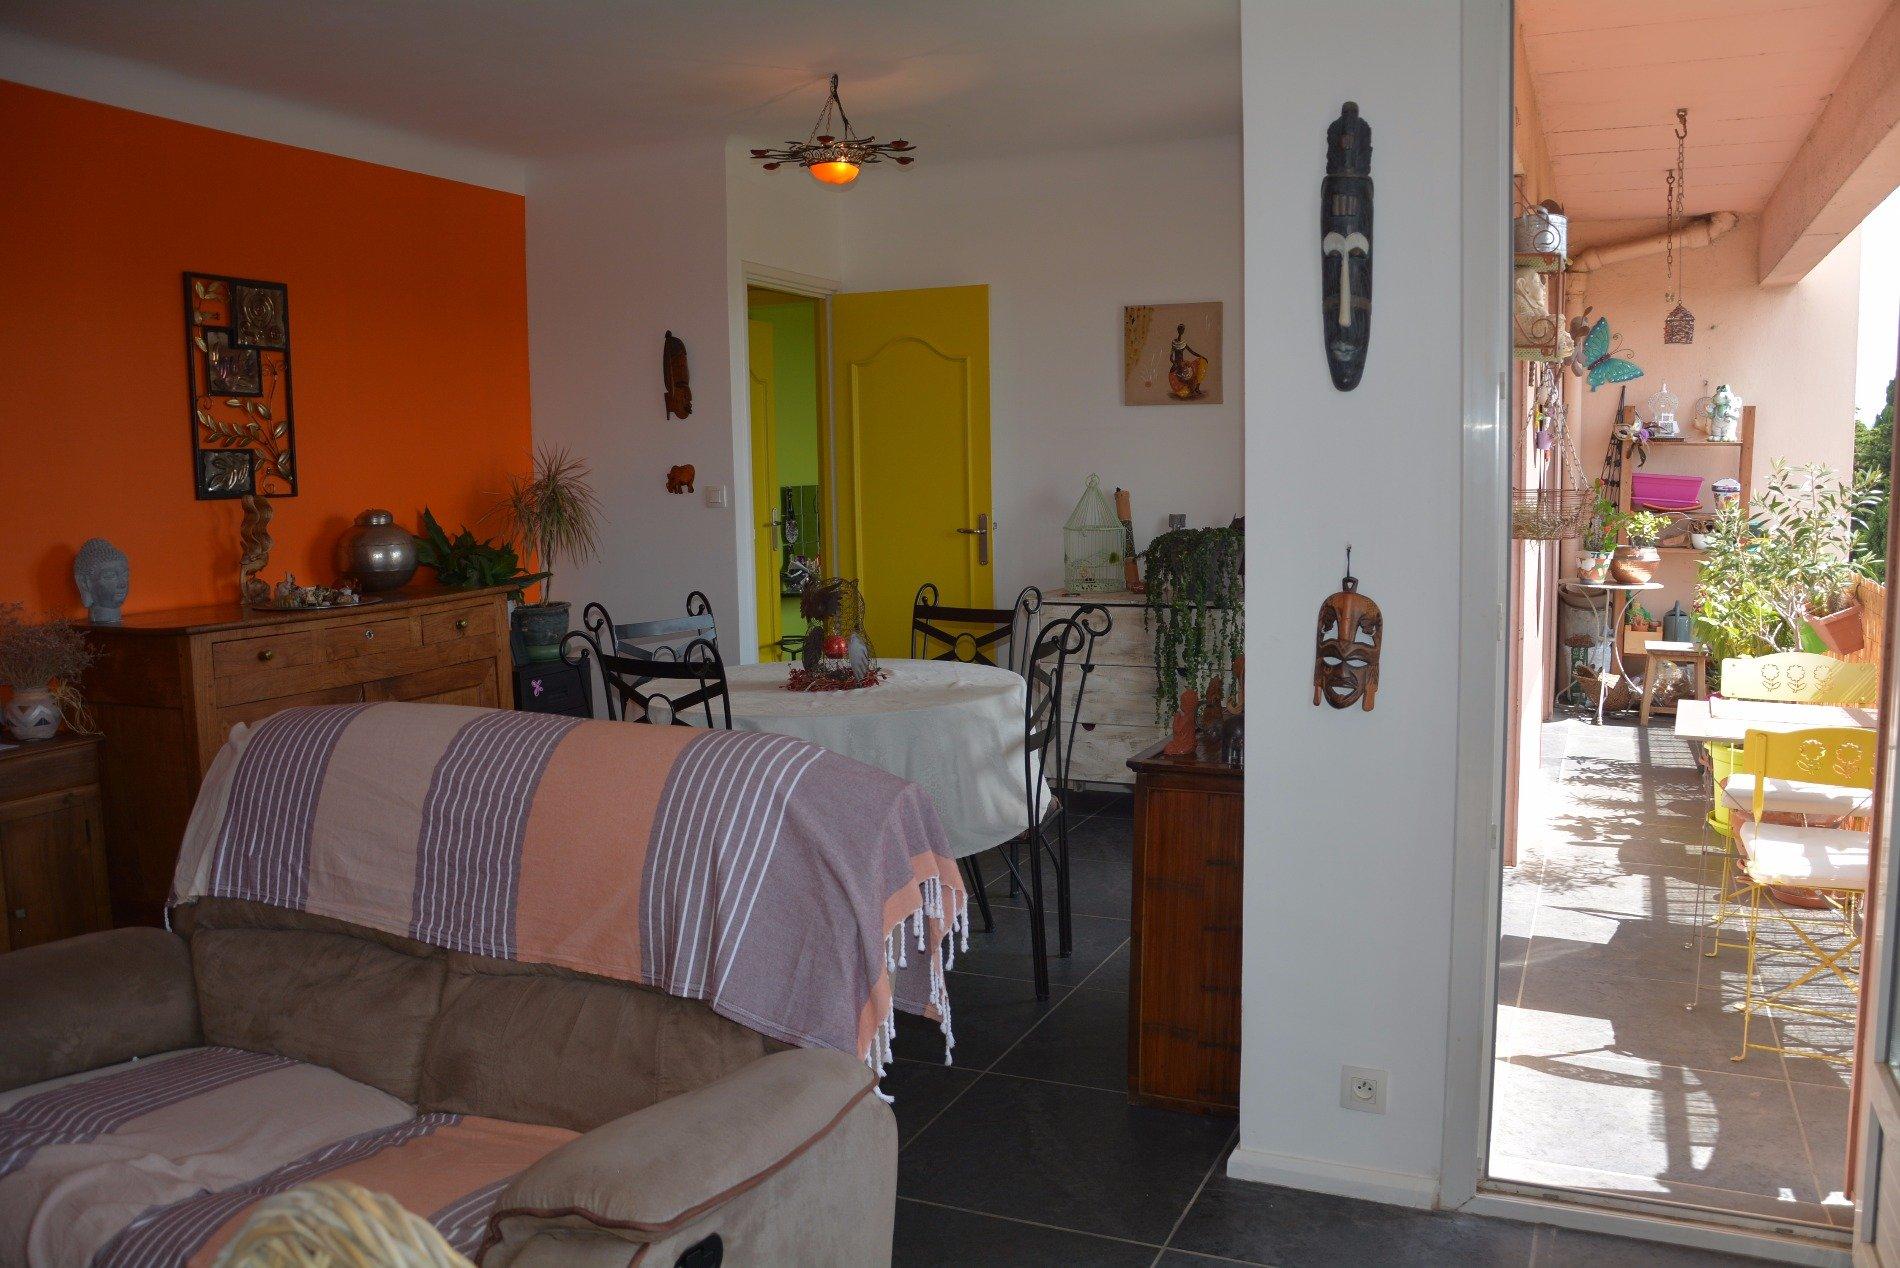 Apartment CARCASSONNE | 79 500 €